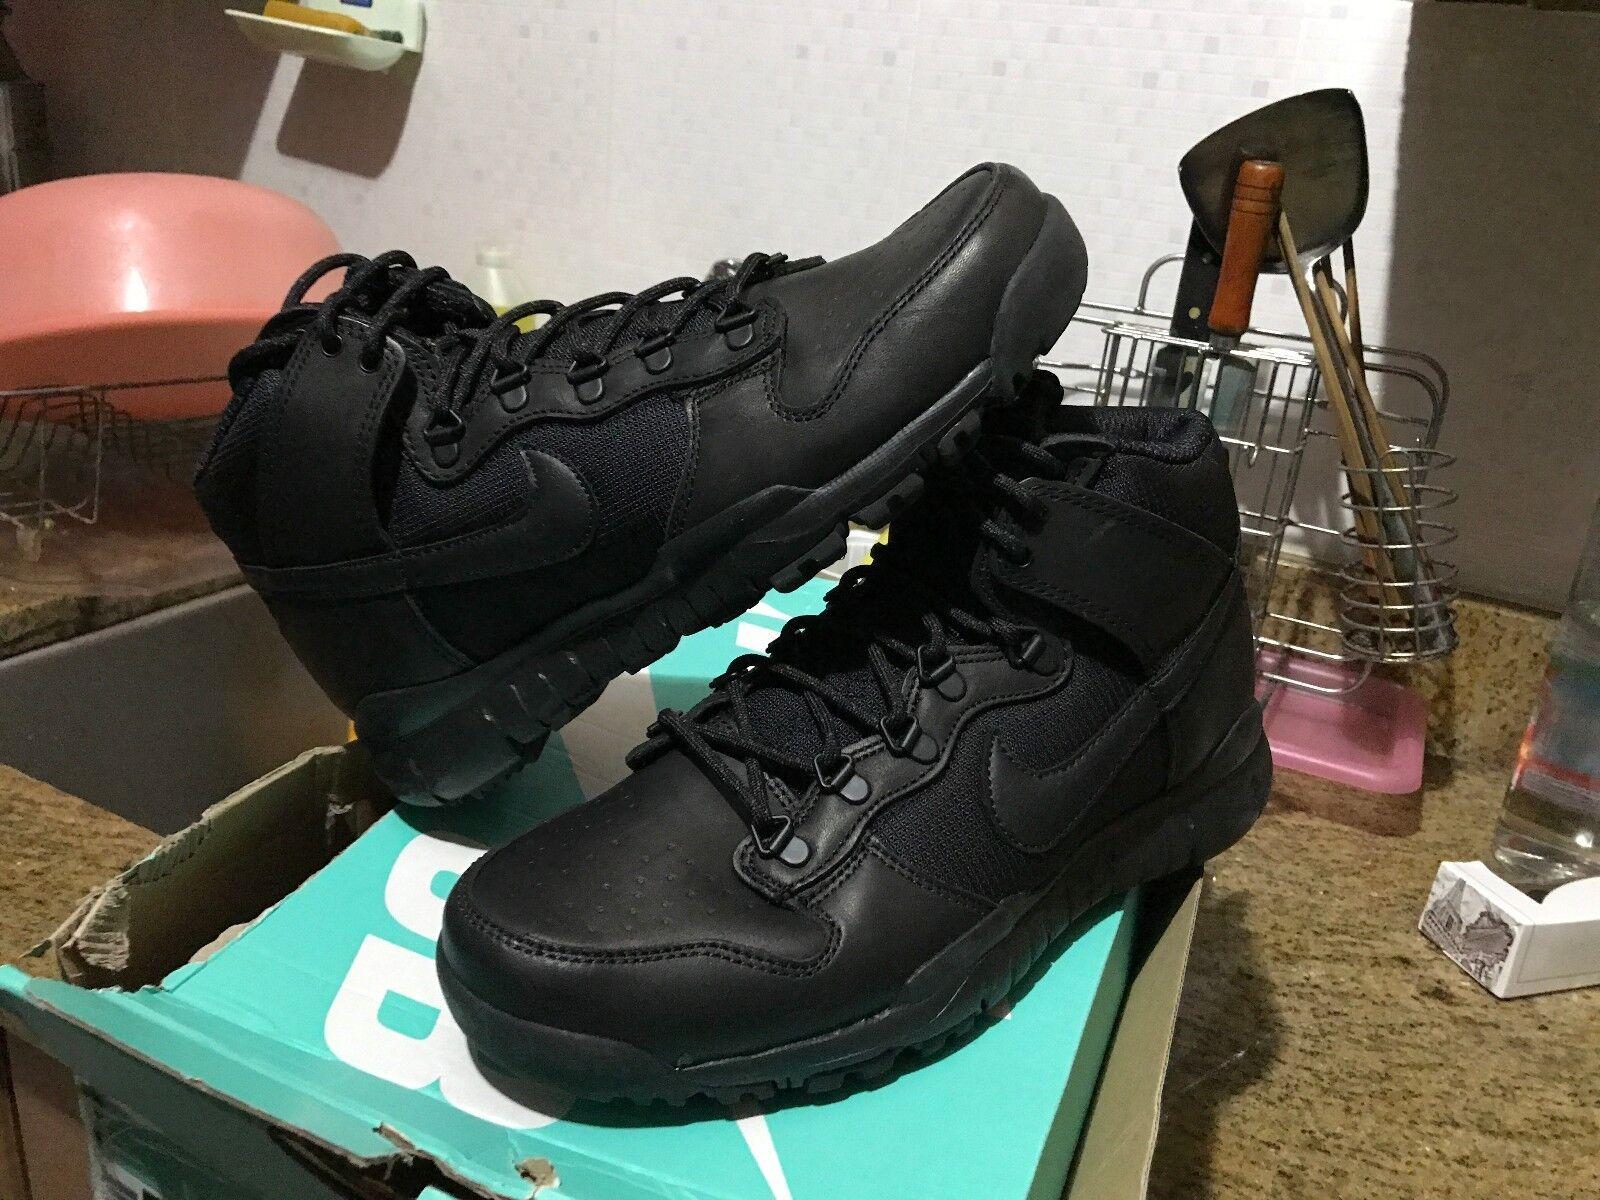 Nike sb canestro alto lustrascarpe noir 536182 001 uomini